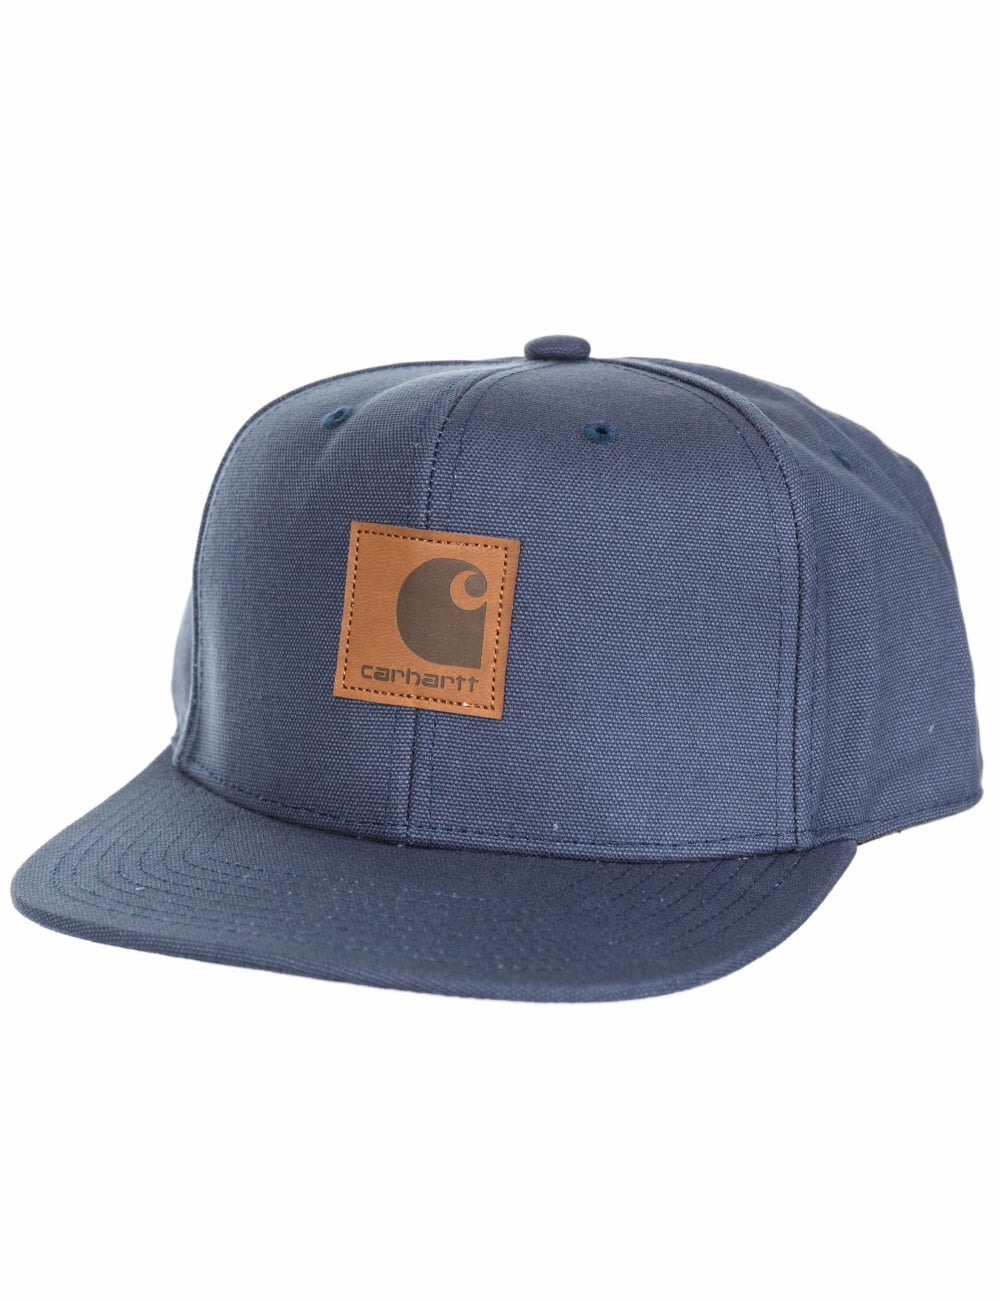 e6f820fe796 Carhartt WIP Logo Cap - Stone Blue - Accessories from Fat Buddha ...